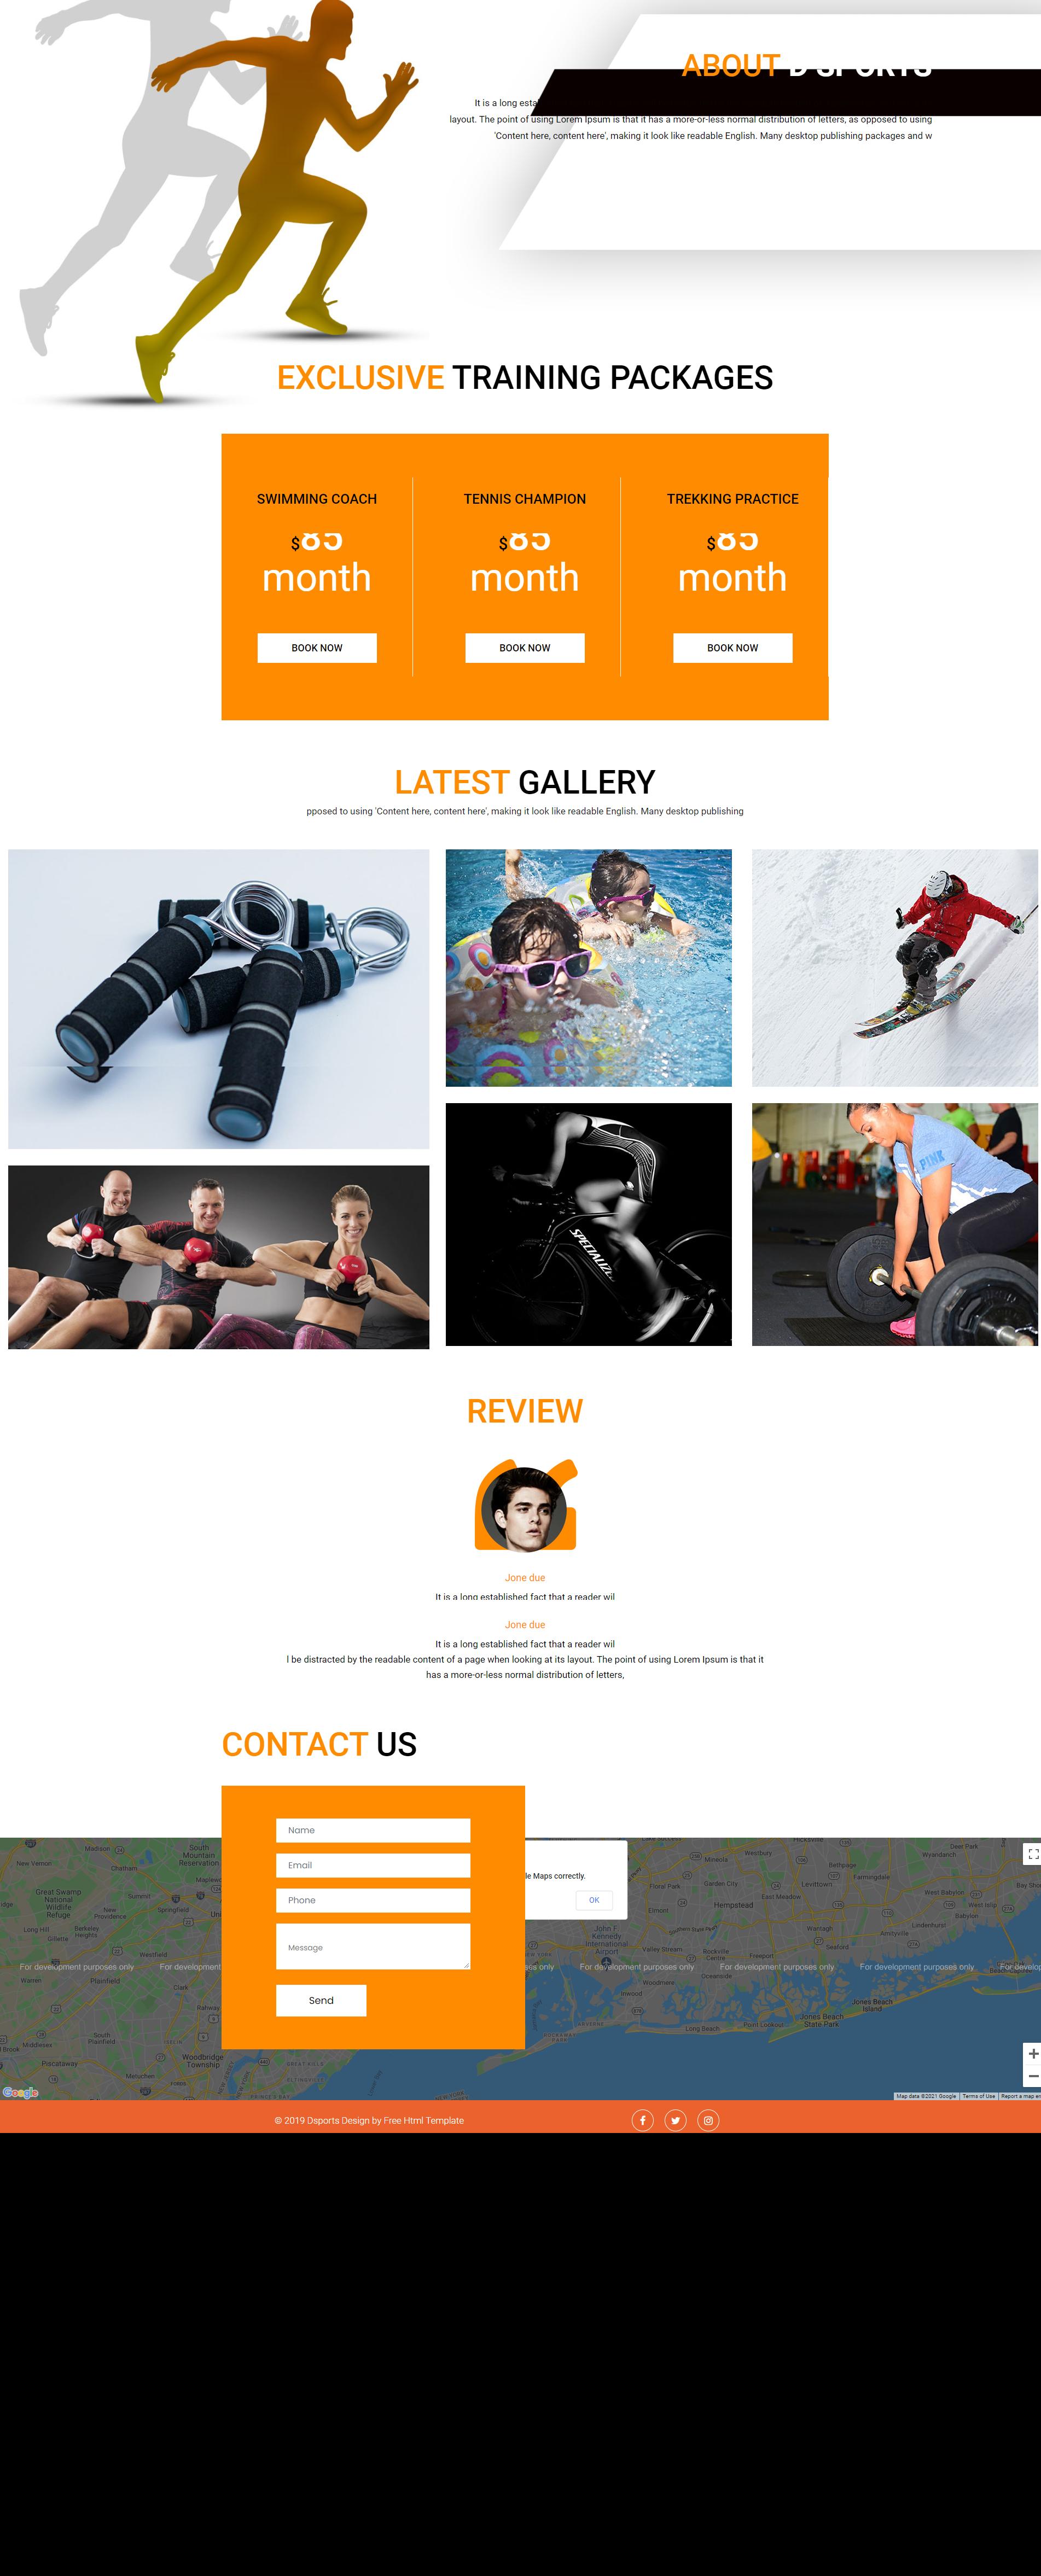 I will install WordPress, theme setup demo and do customization